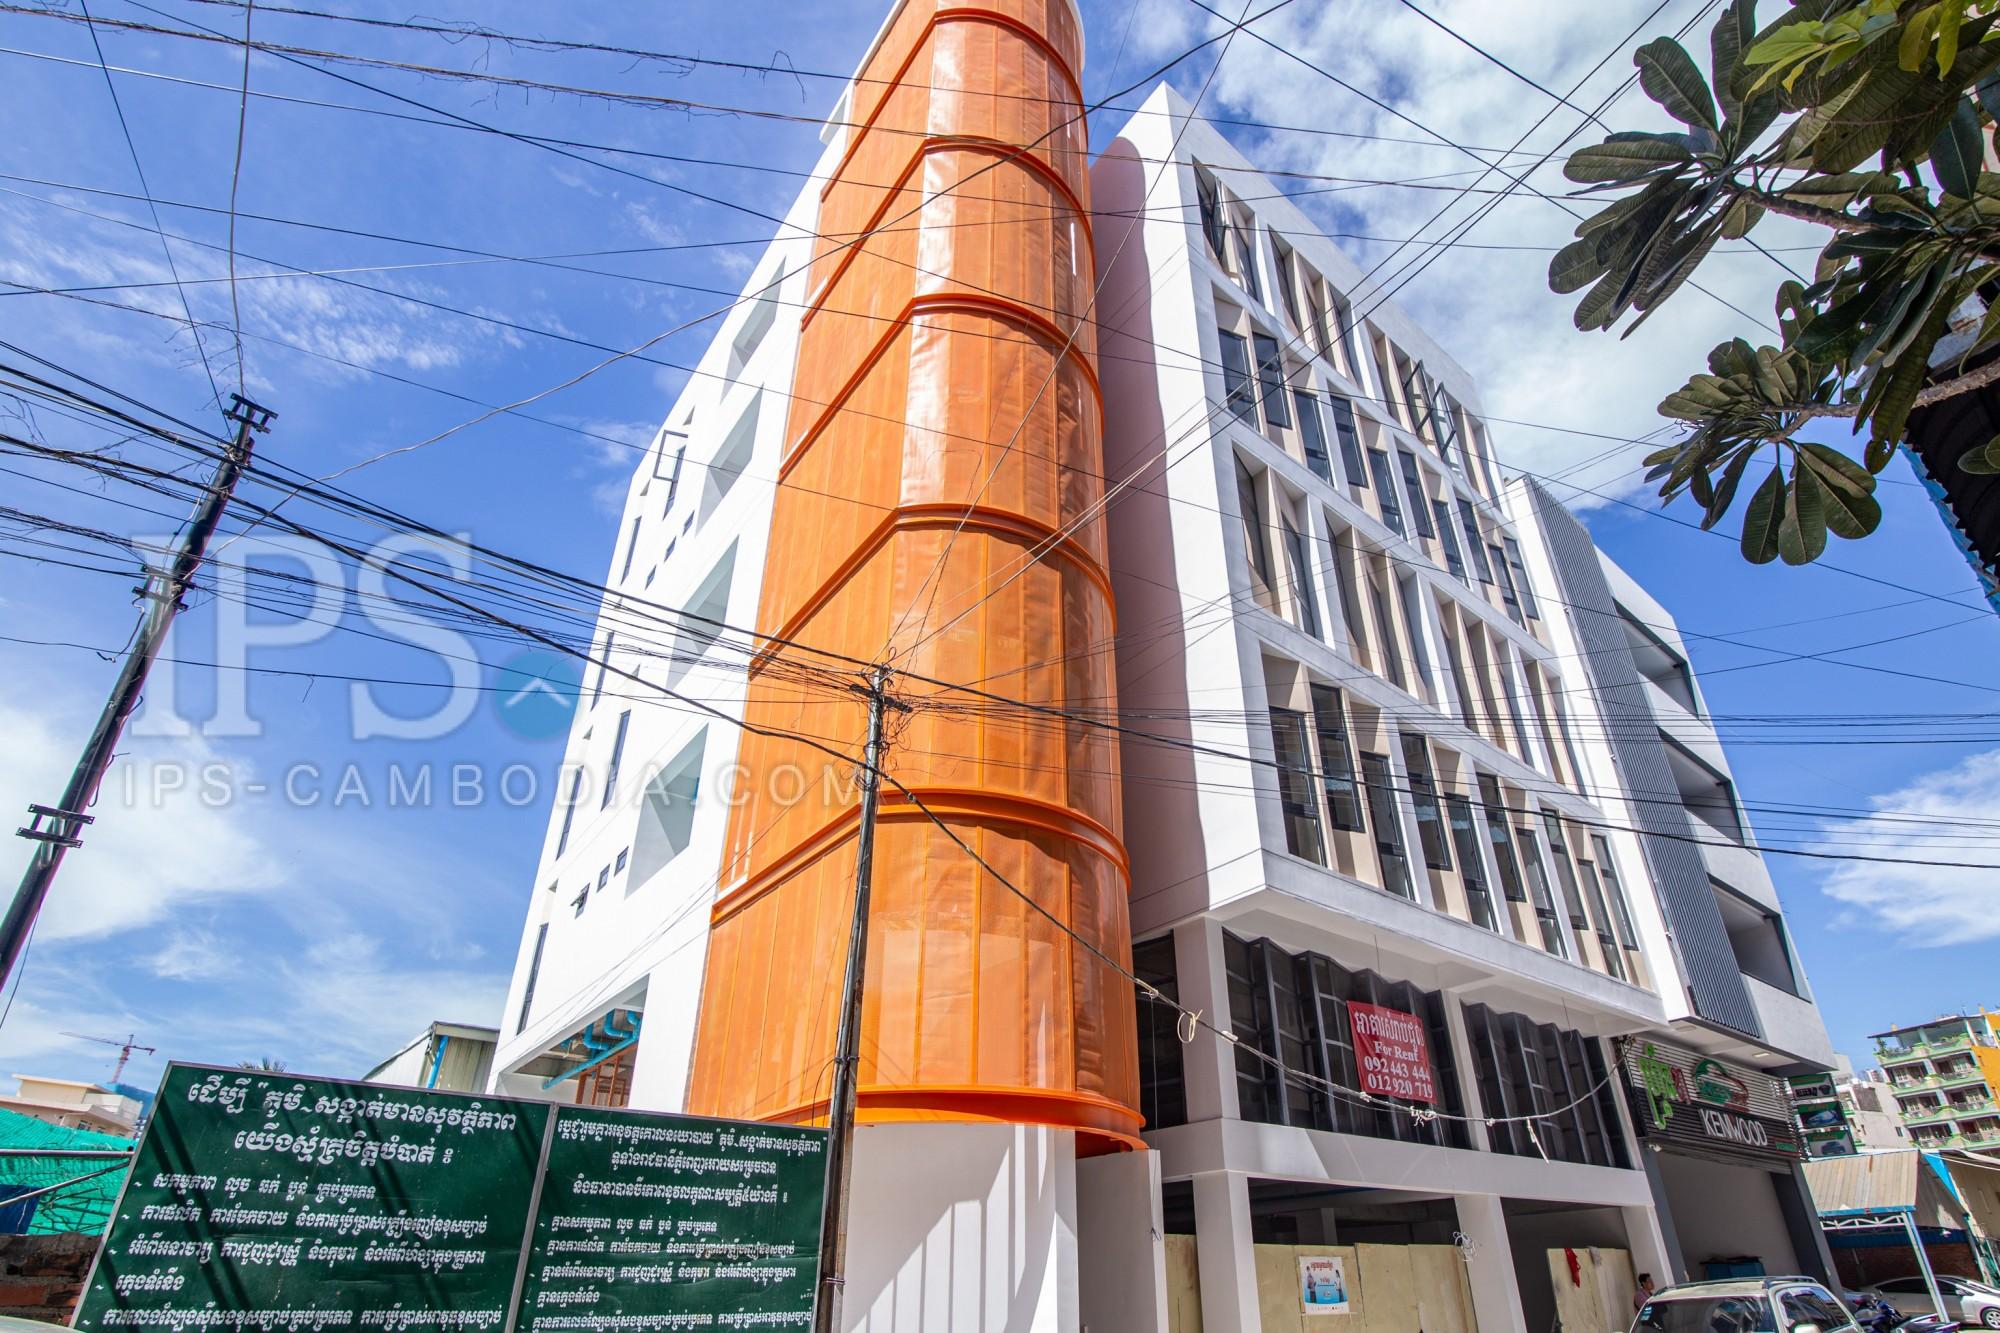 4 Floor Commercial Building For Rent - Toul Kork, Phnom Penh